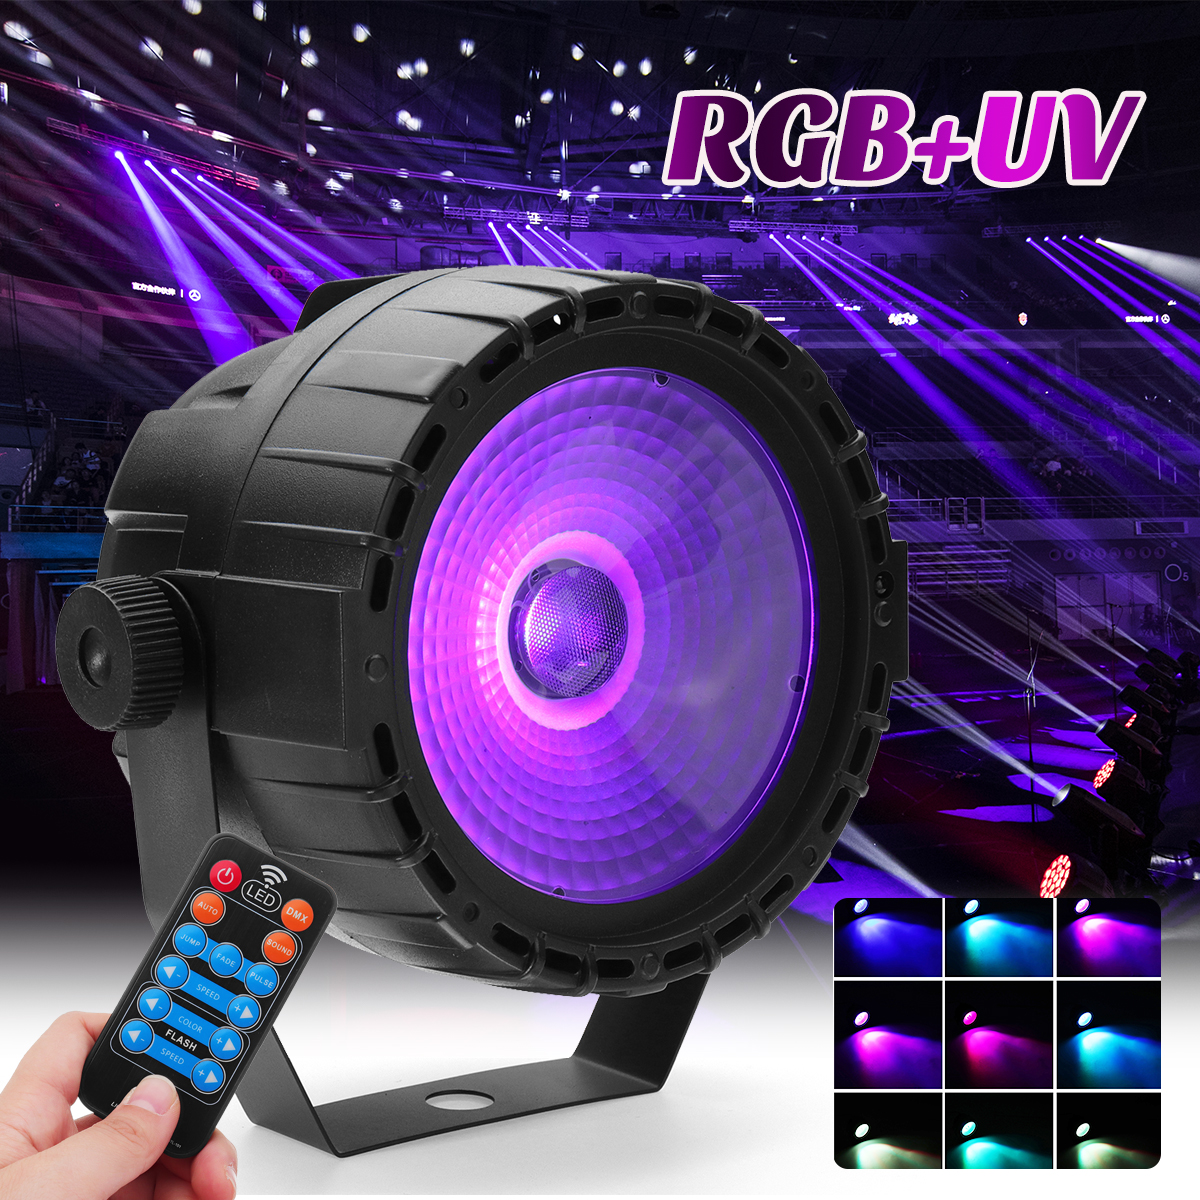 30W LED  Light Remote Control RGB + UV Self-propelled/Voice Control/DMX512 For DJ Bar Party Bar Church 90-240V US/Eu Plug